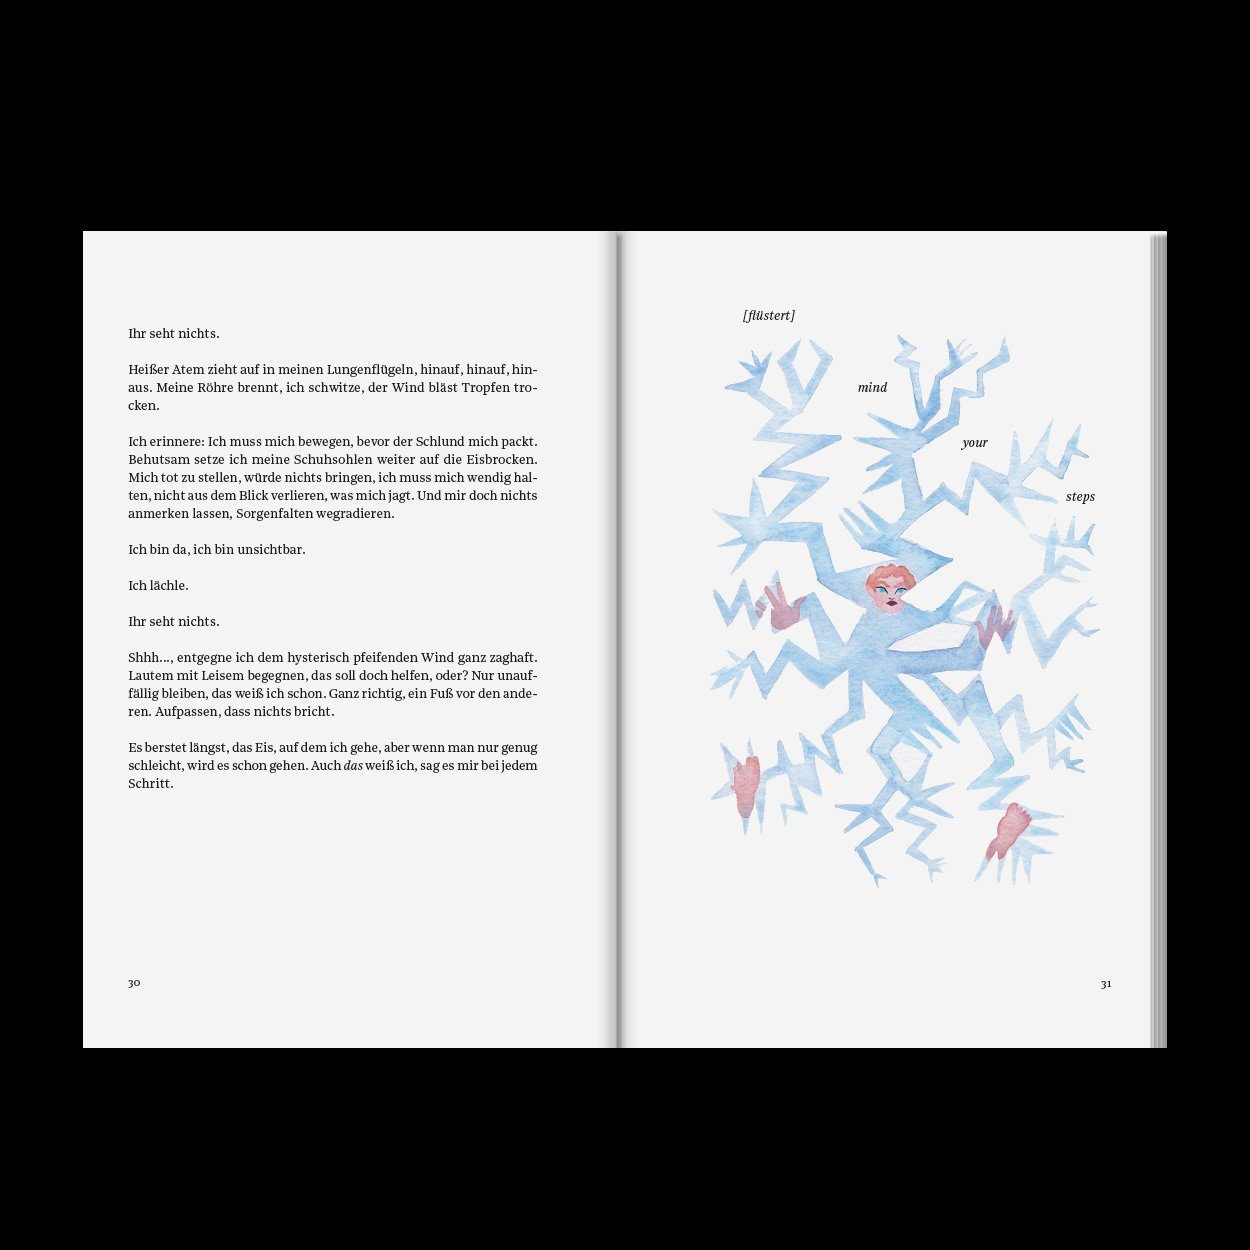 Korbinian Verlag Sicherinnern5 2048x